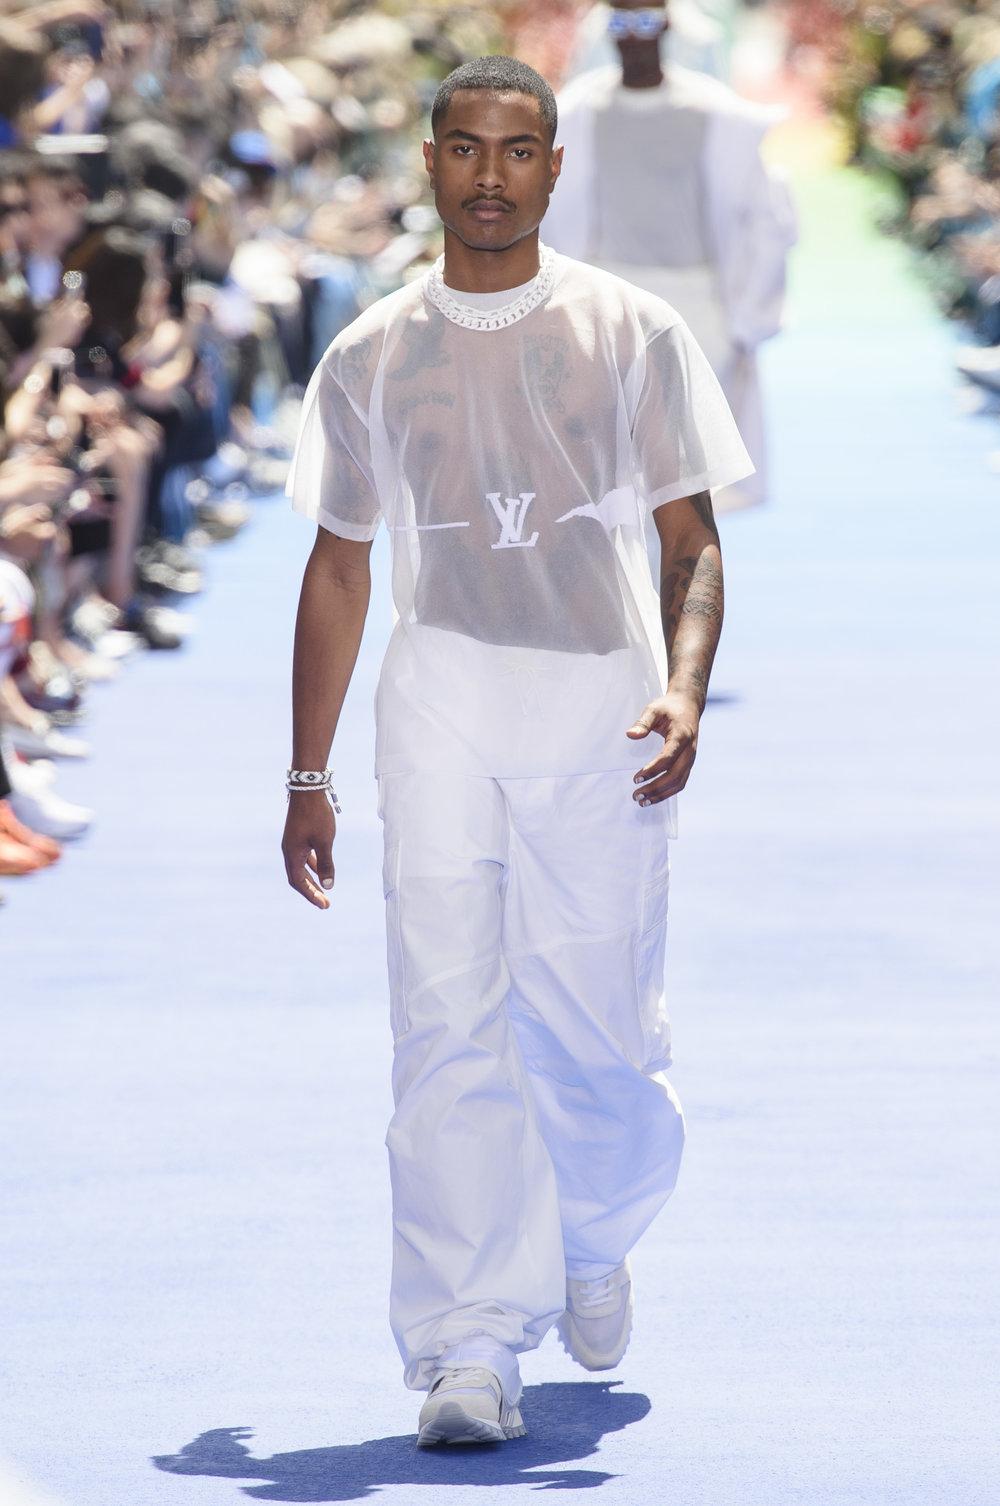 06_Louis_Vuitton_original_vui_prs_ss19_019.jpg